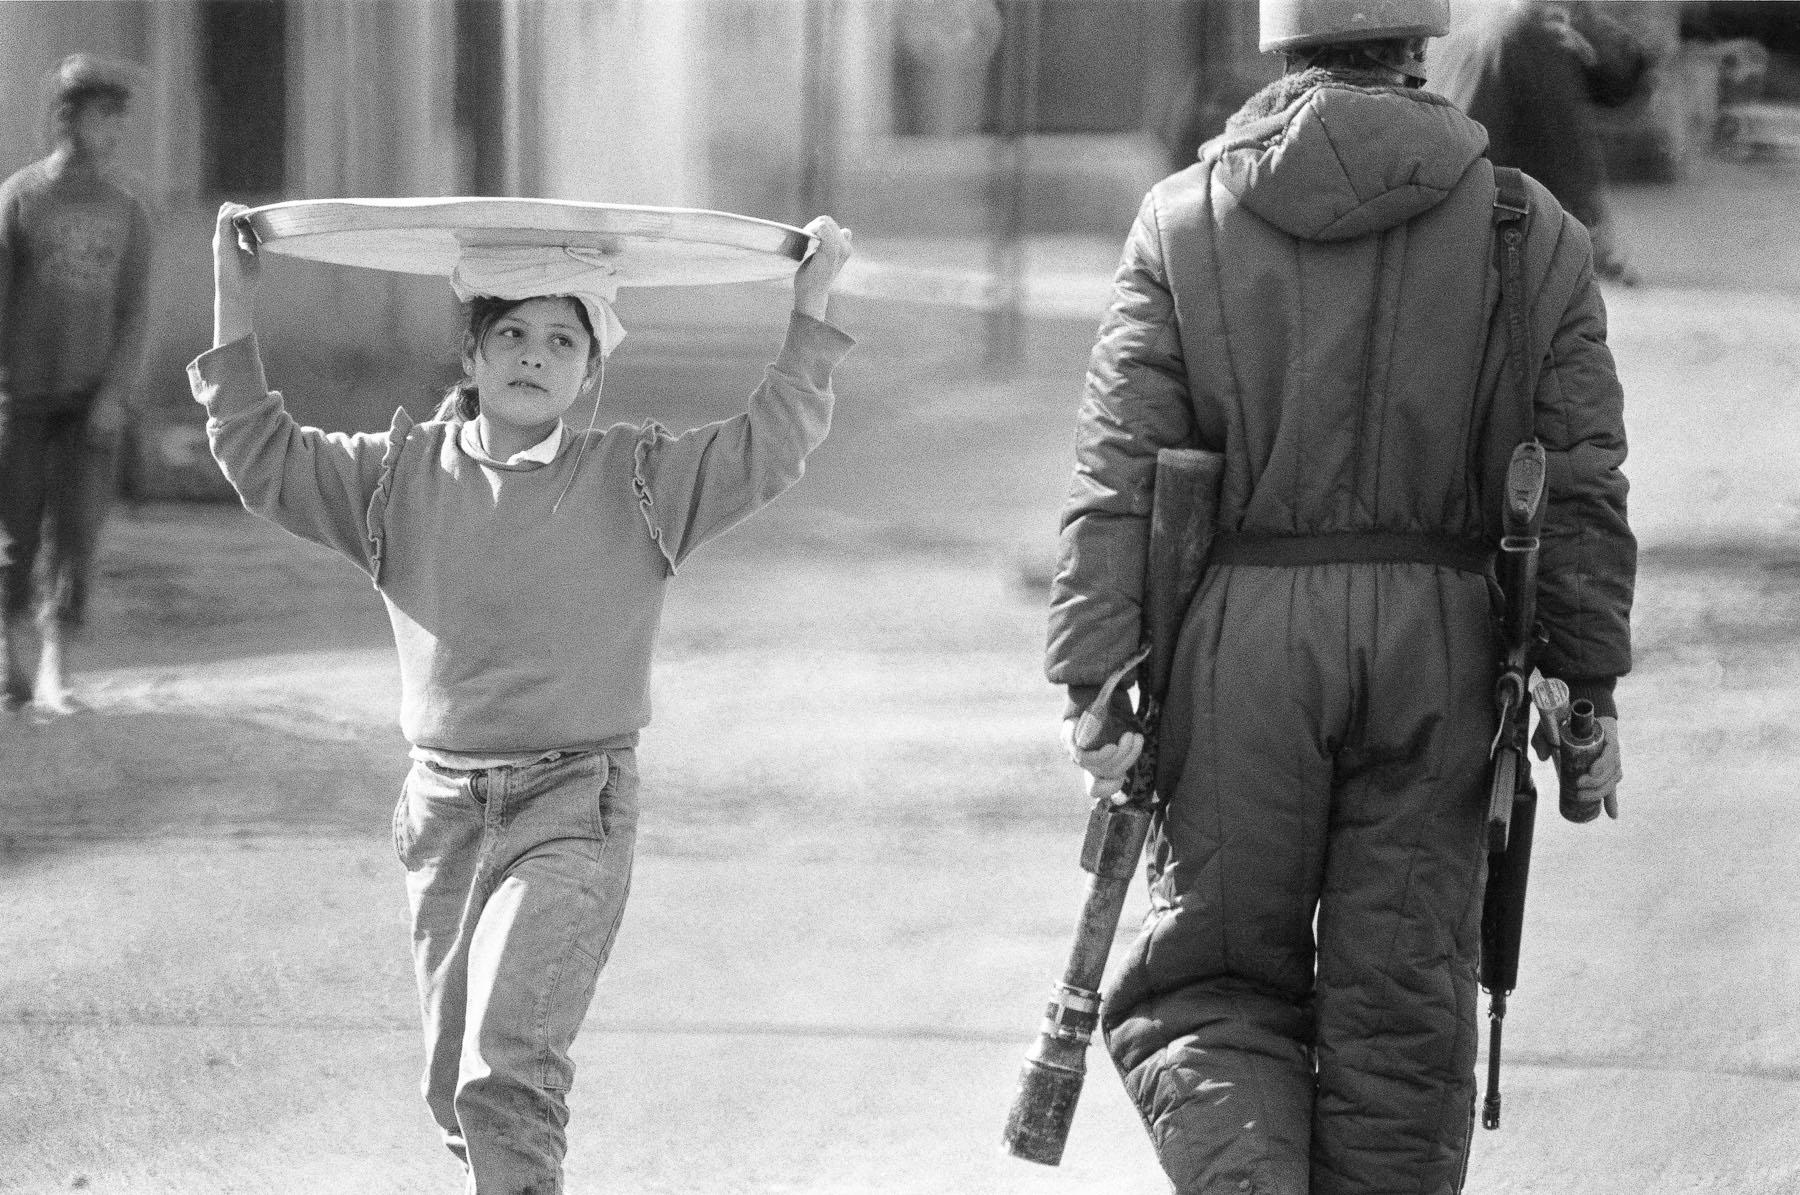 A Palestinian girl walks past an Israelian soldier in Al-Amari camp in January 1988